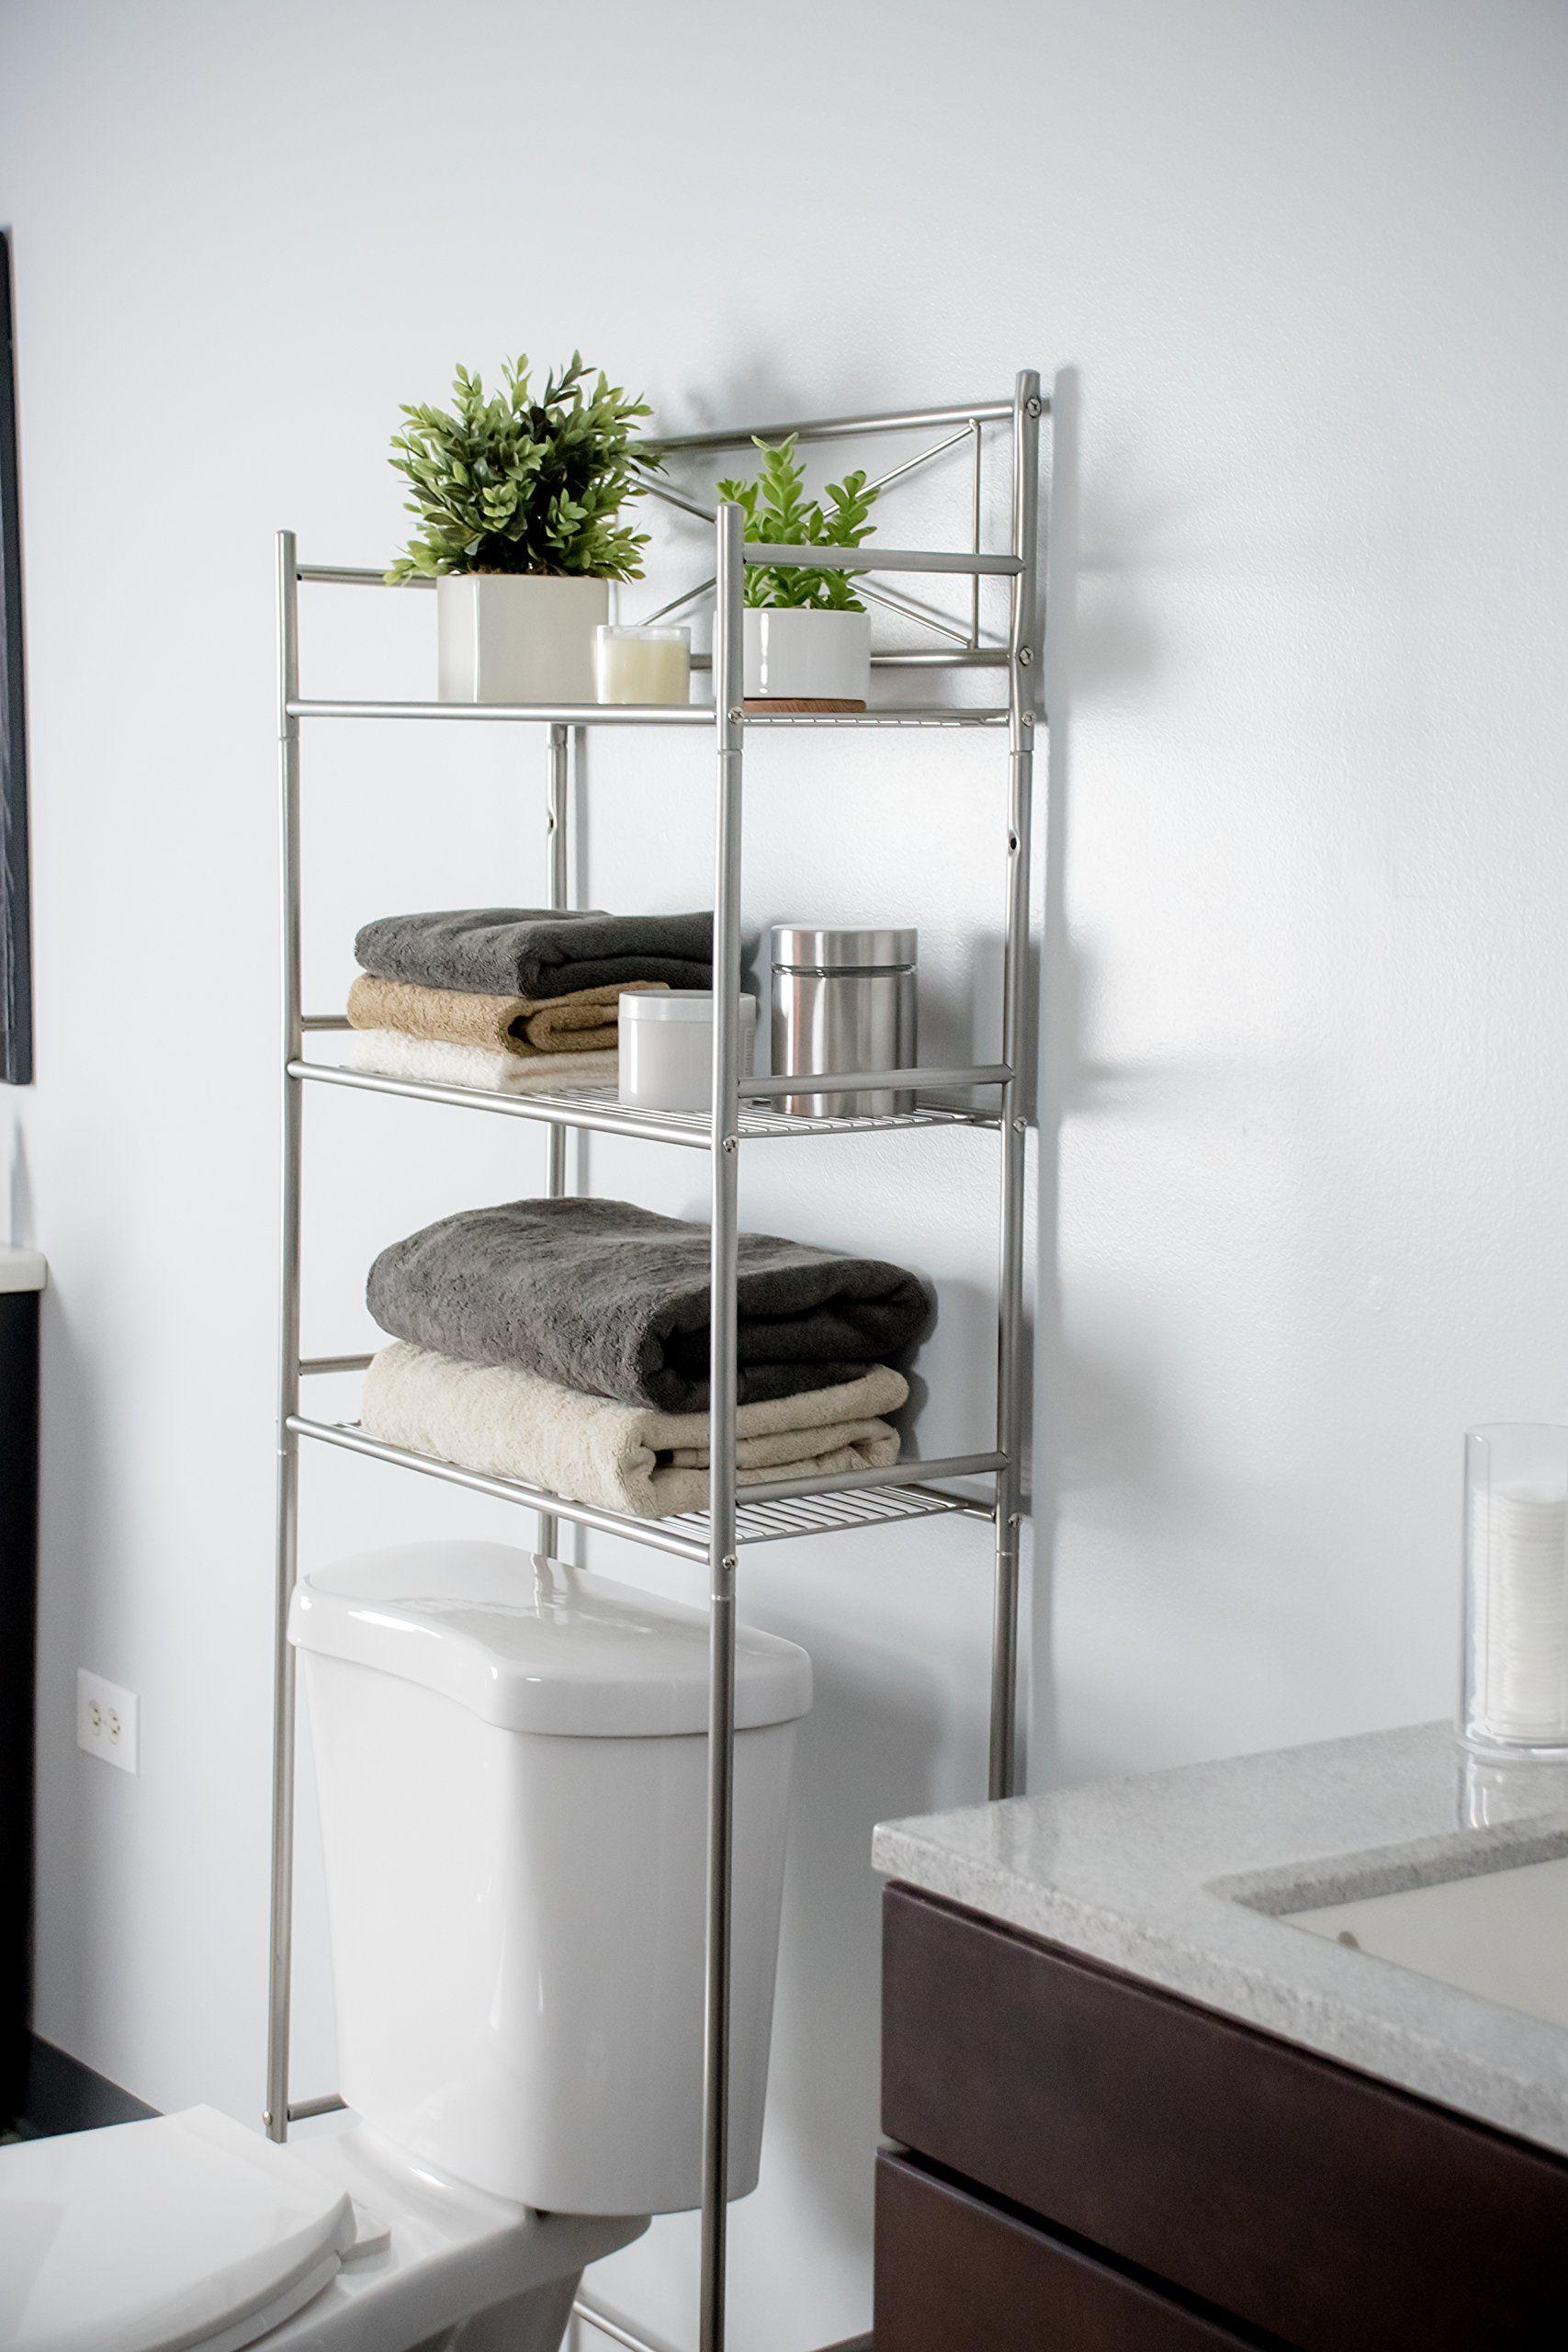 Space Saving 3 Piece Bathroom Organizer Set By Ldr Includes 3 Shelf